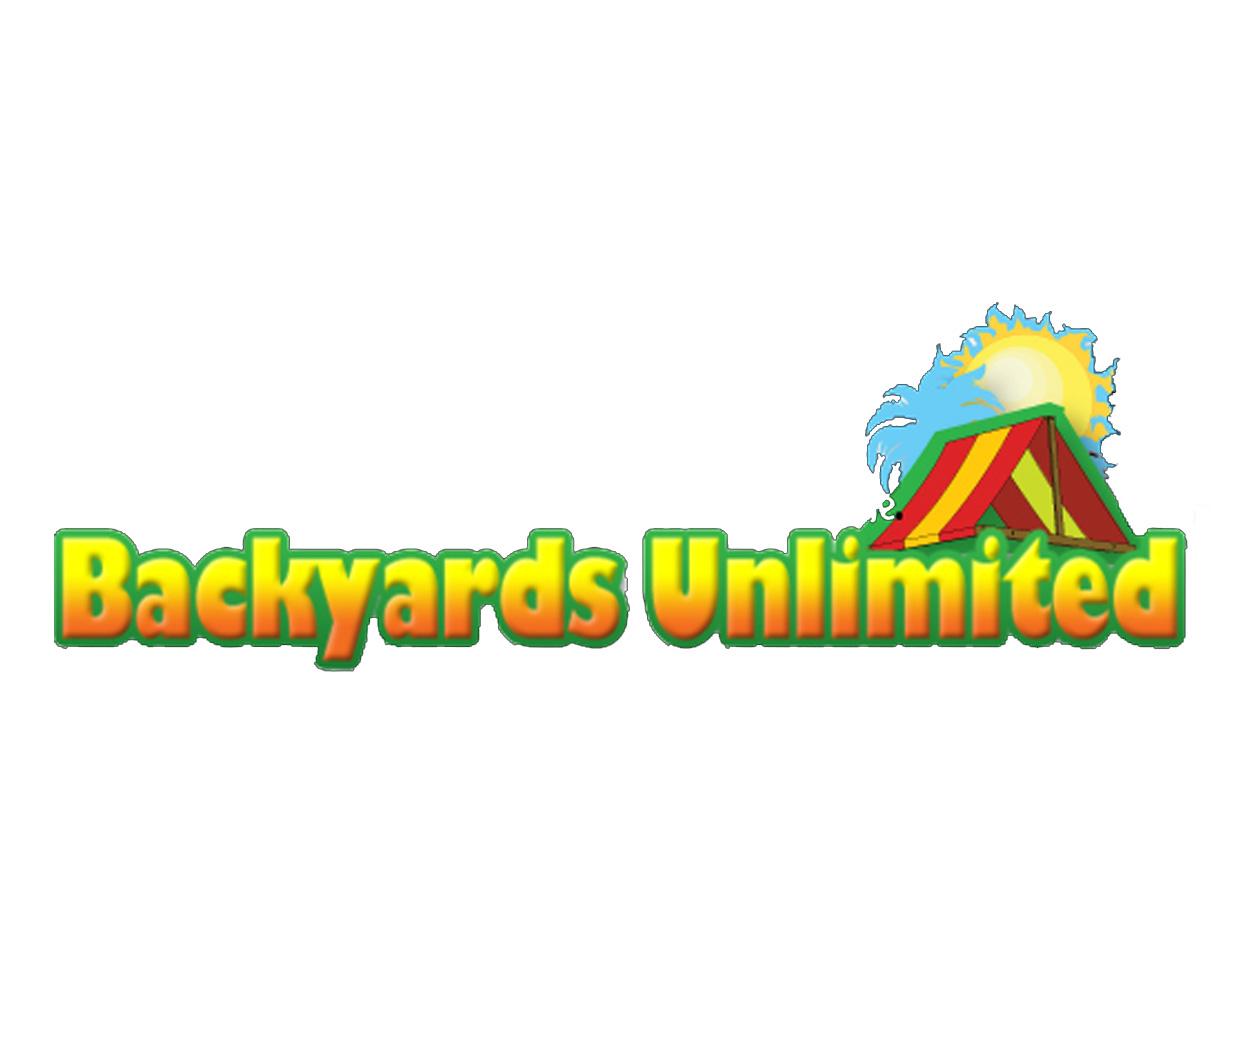 backyards unlimited